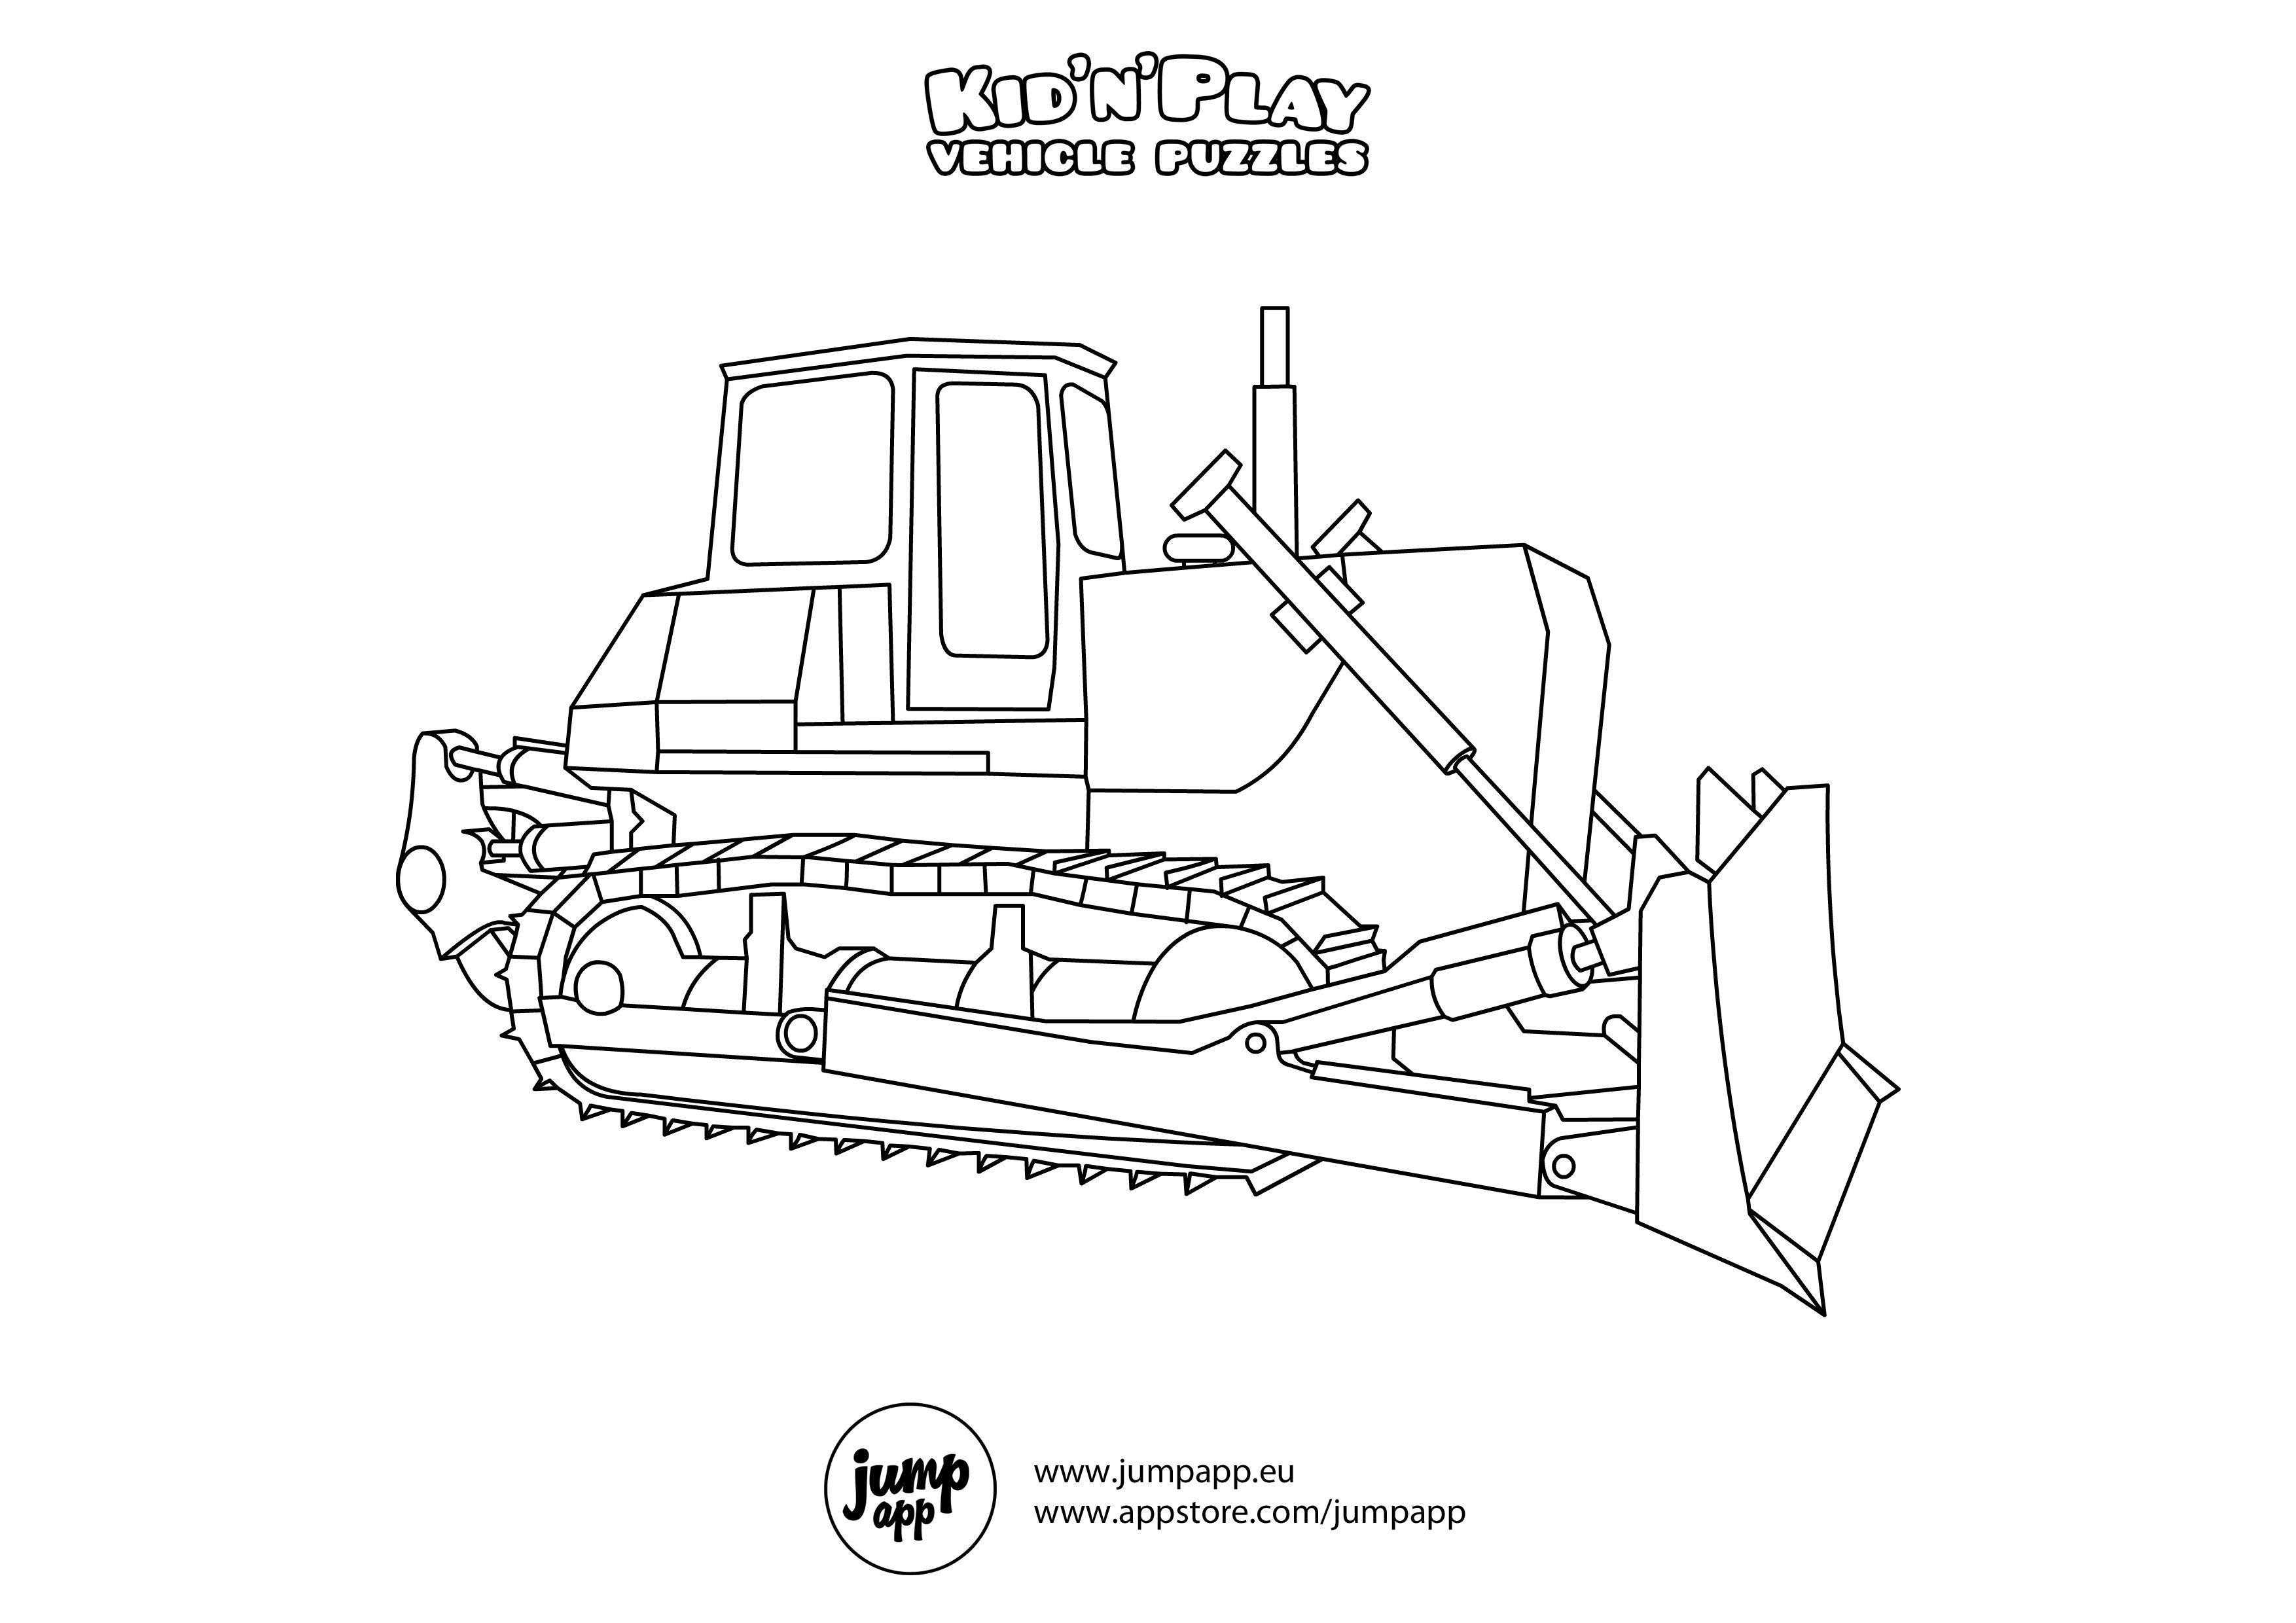 bulldozer pictures to color bulldozer coloring page coloring funs bulldozer pictures to color